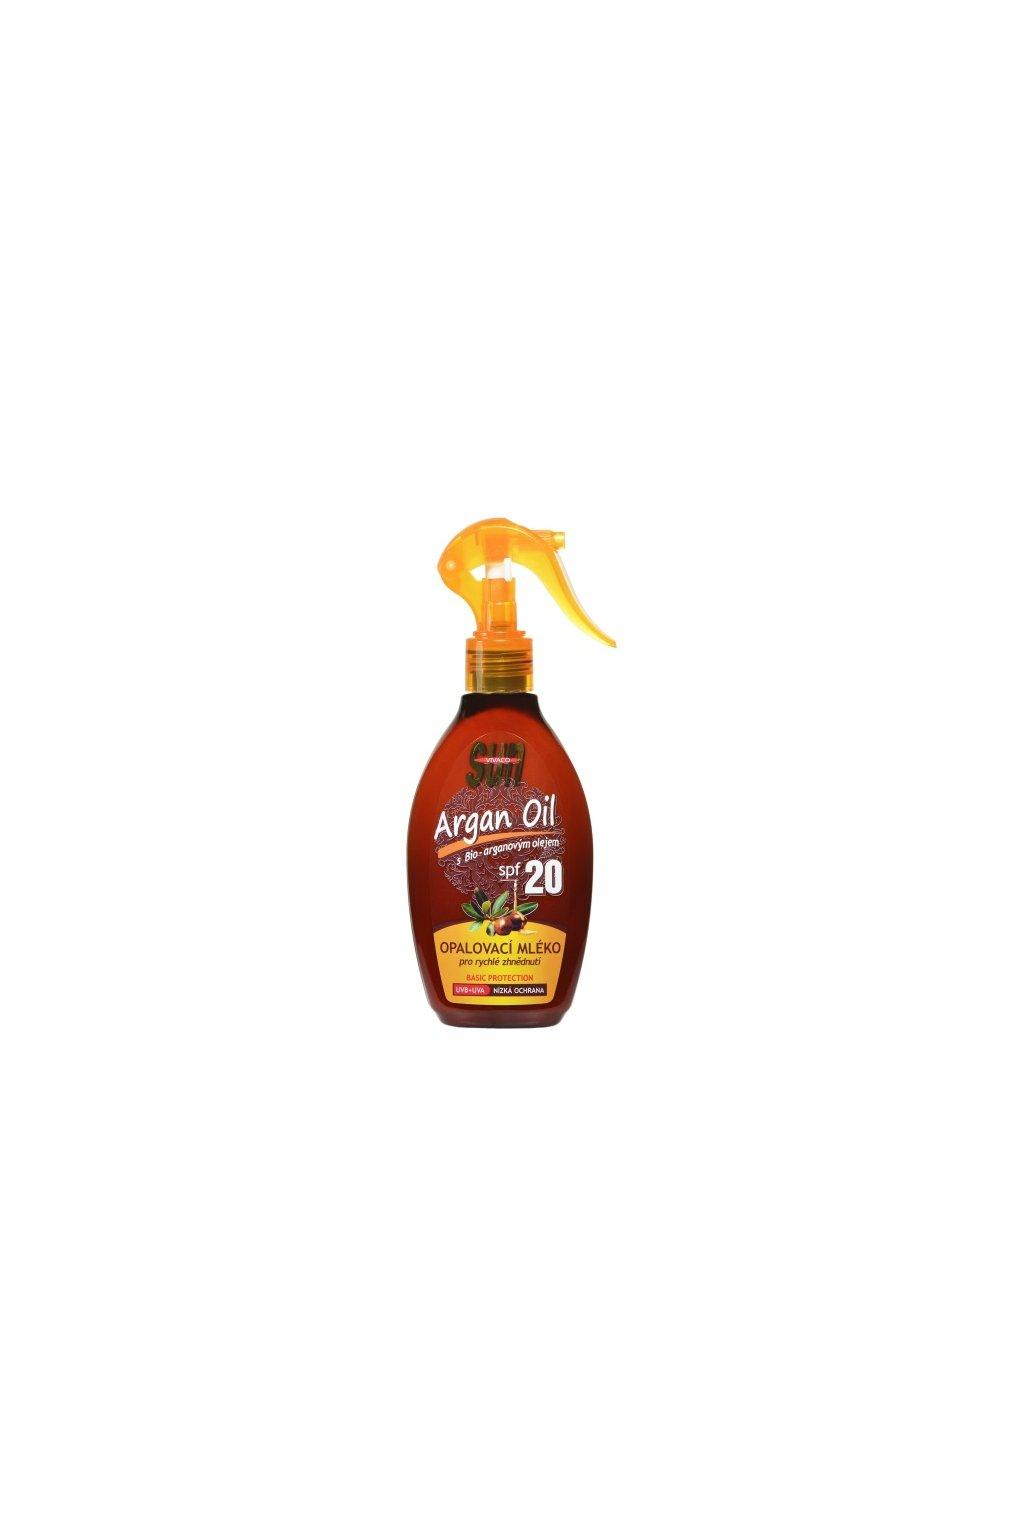 18236 vivaco opalovaci mleko s bio arganovym olejem spf 20 sun vital 200 ml